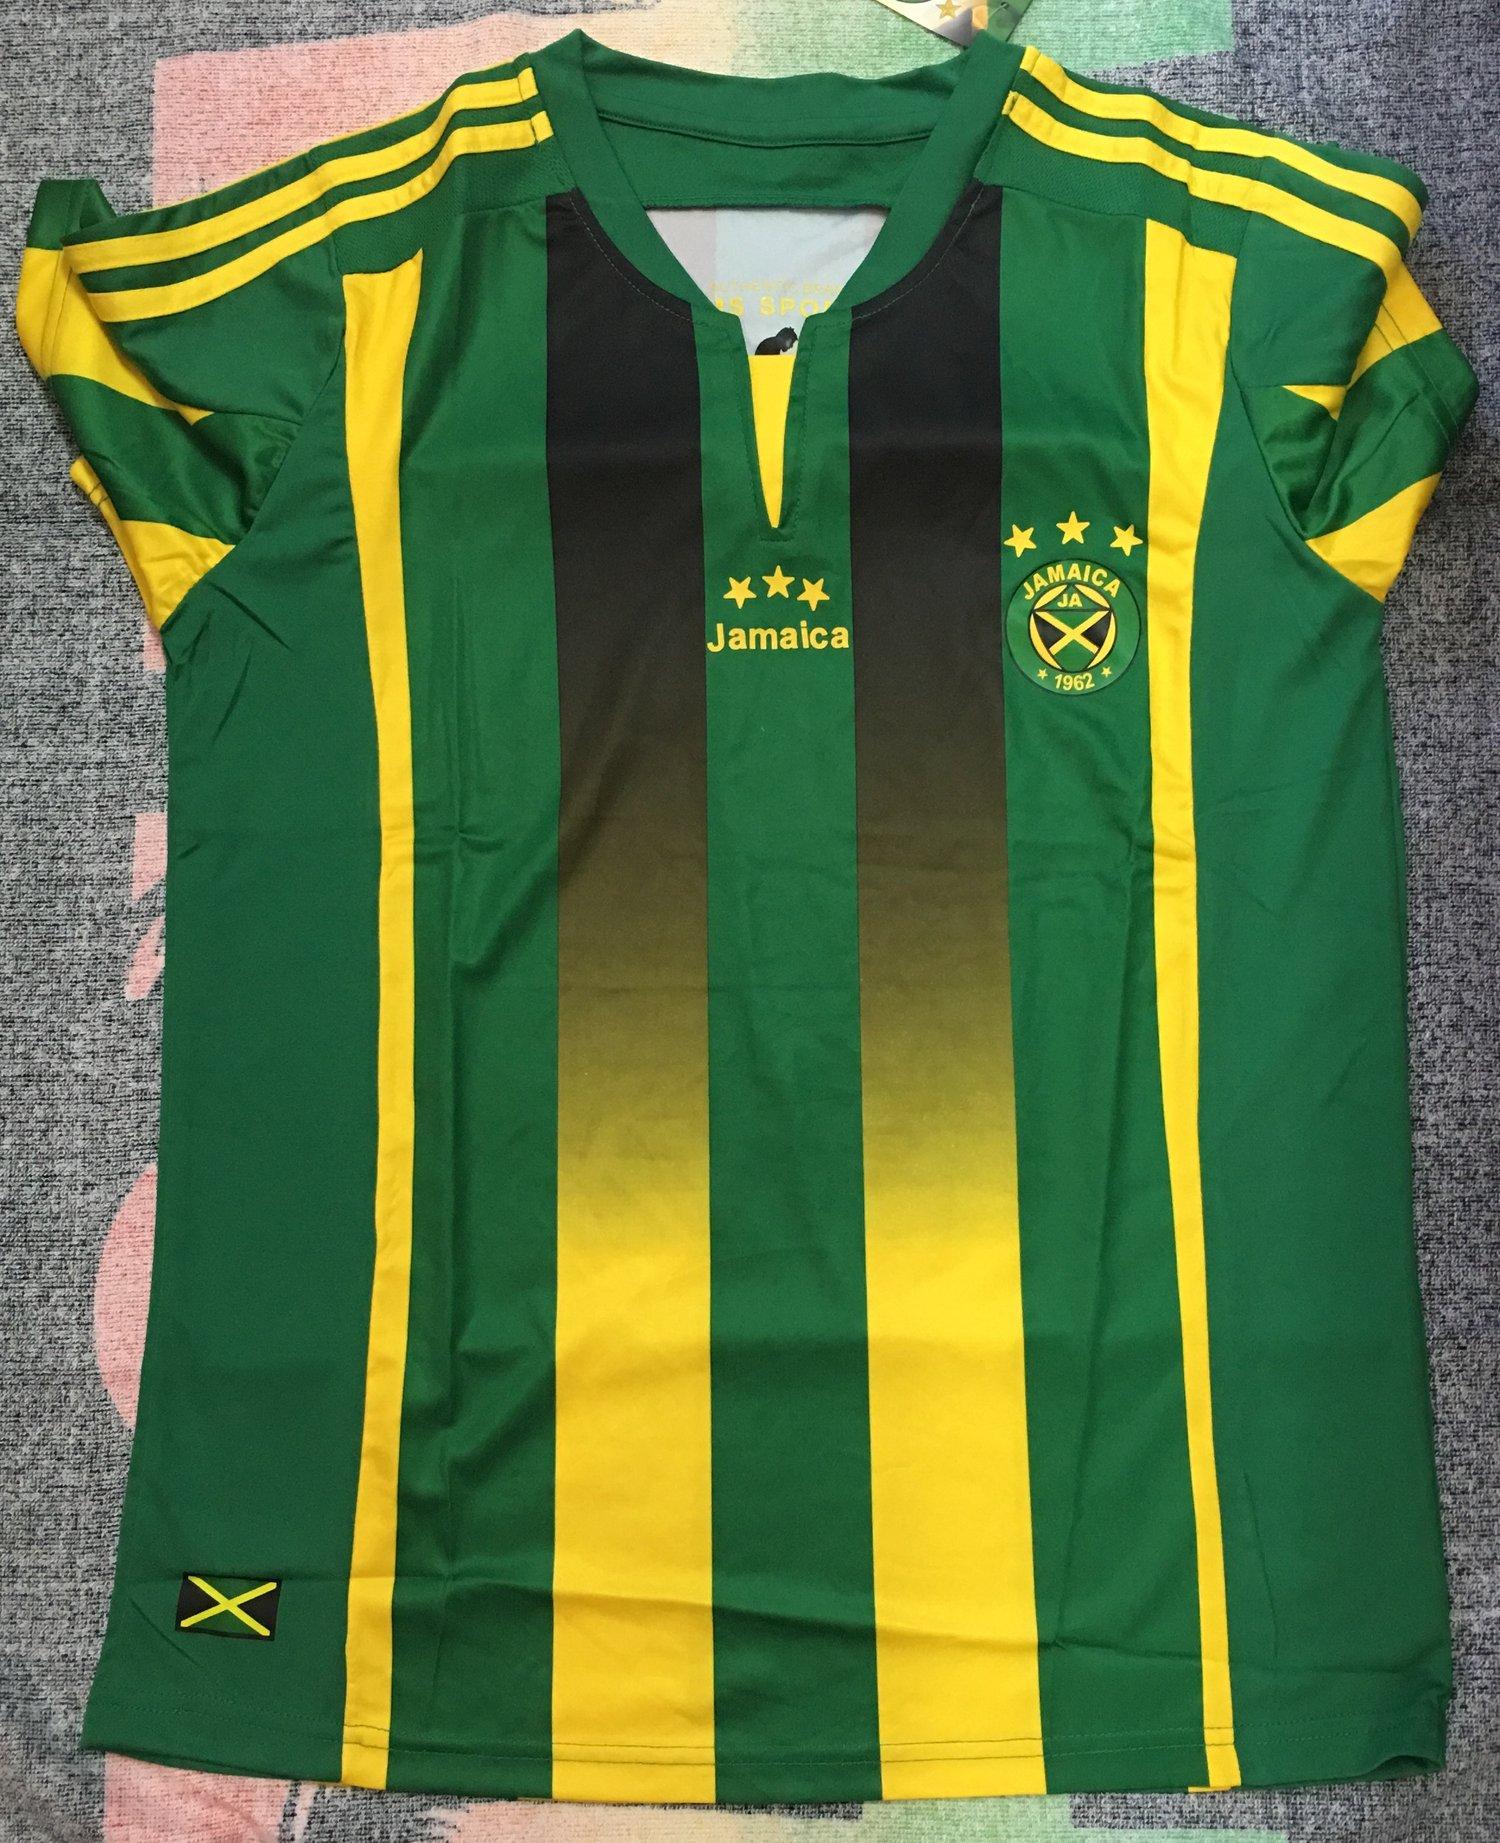 9bf81996c9c Image of Green Jamaica Football Jersey